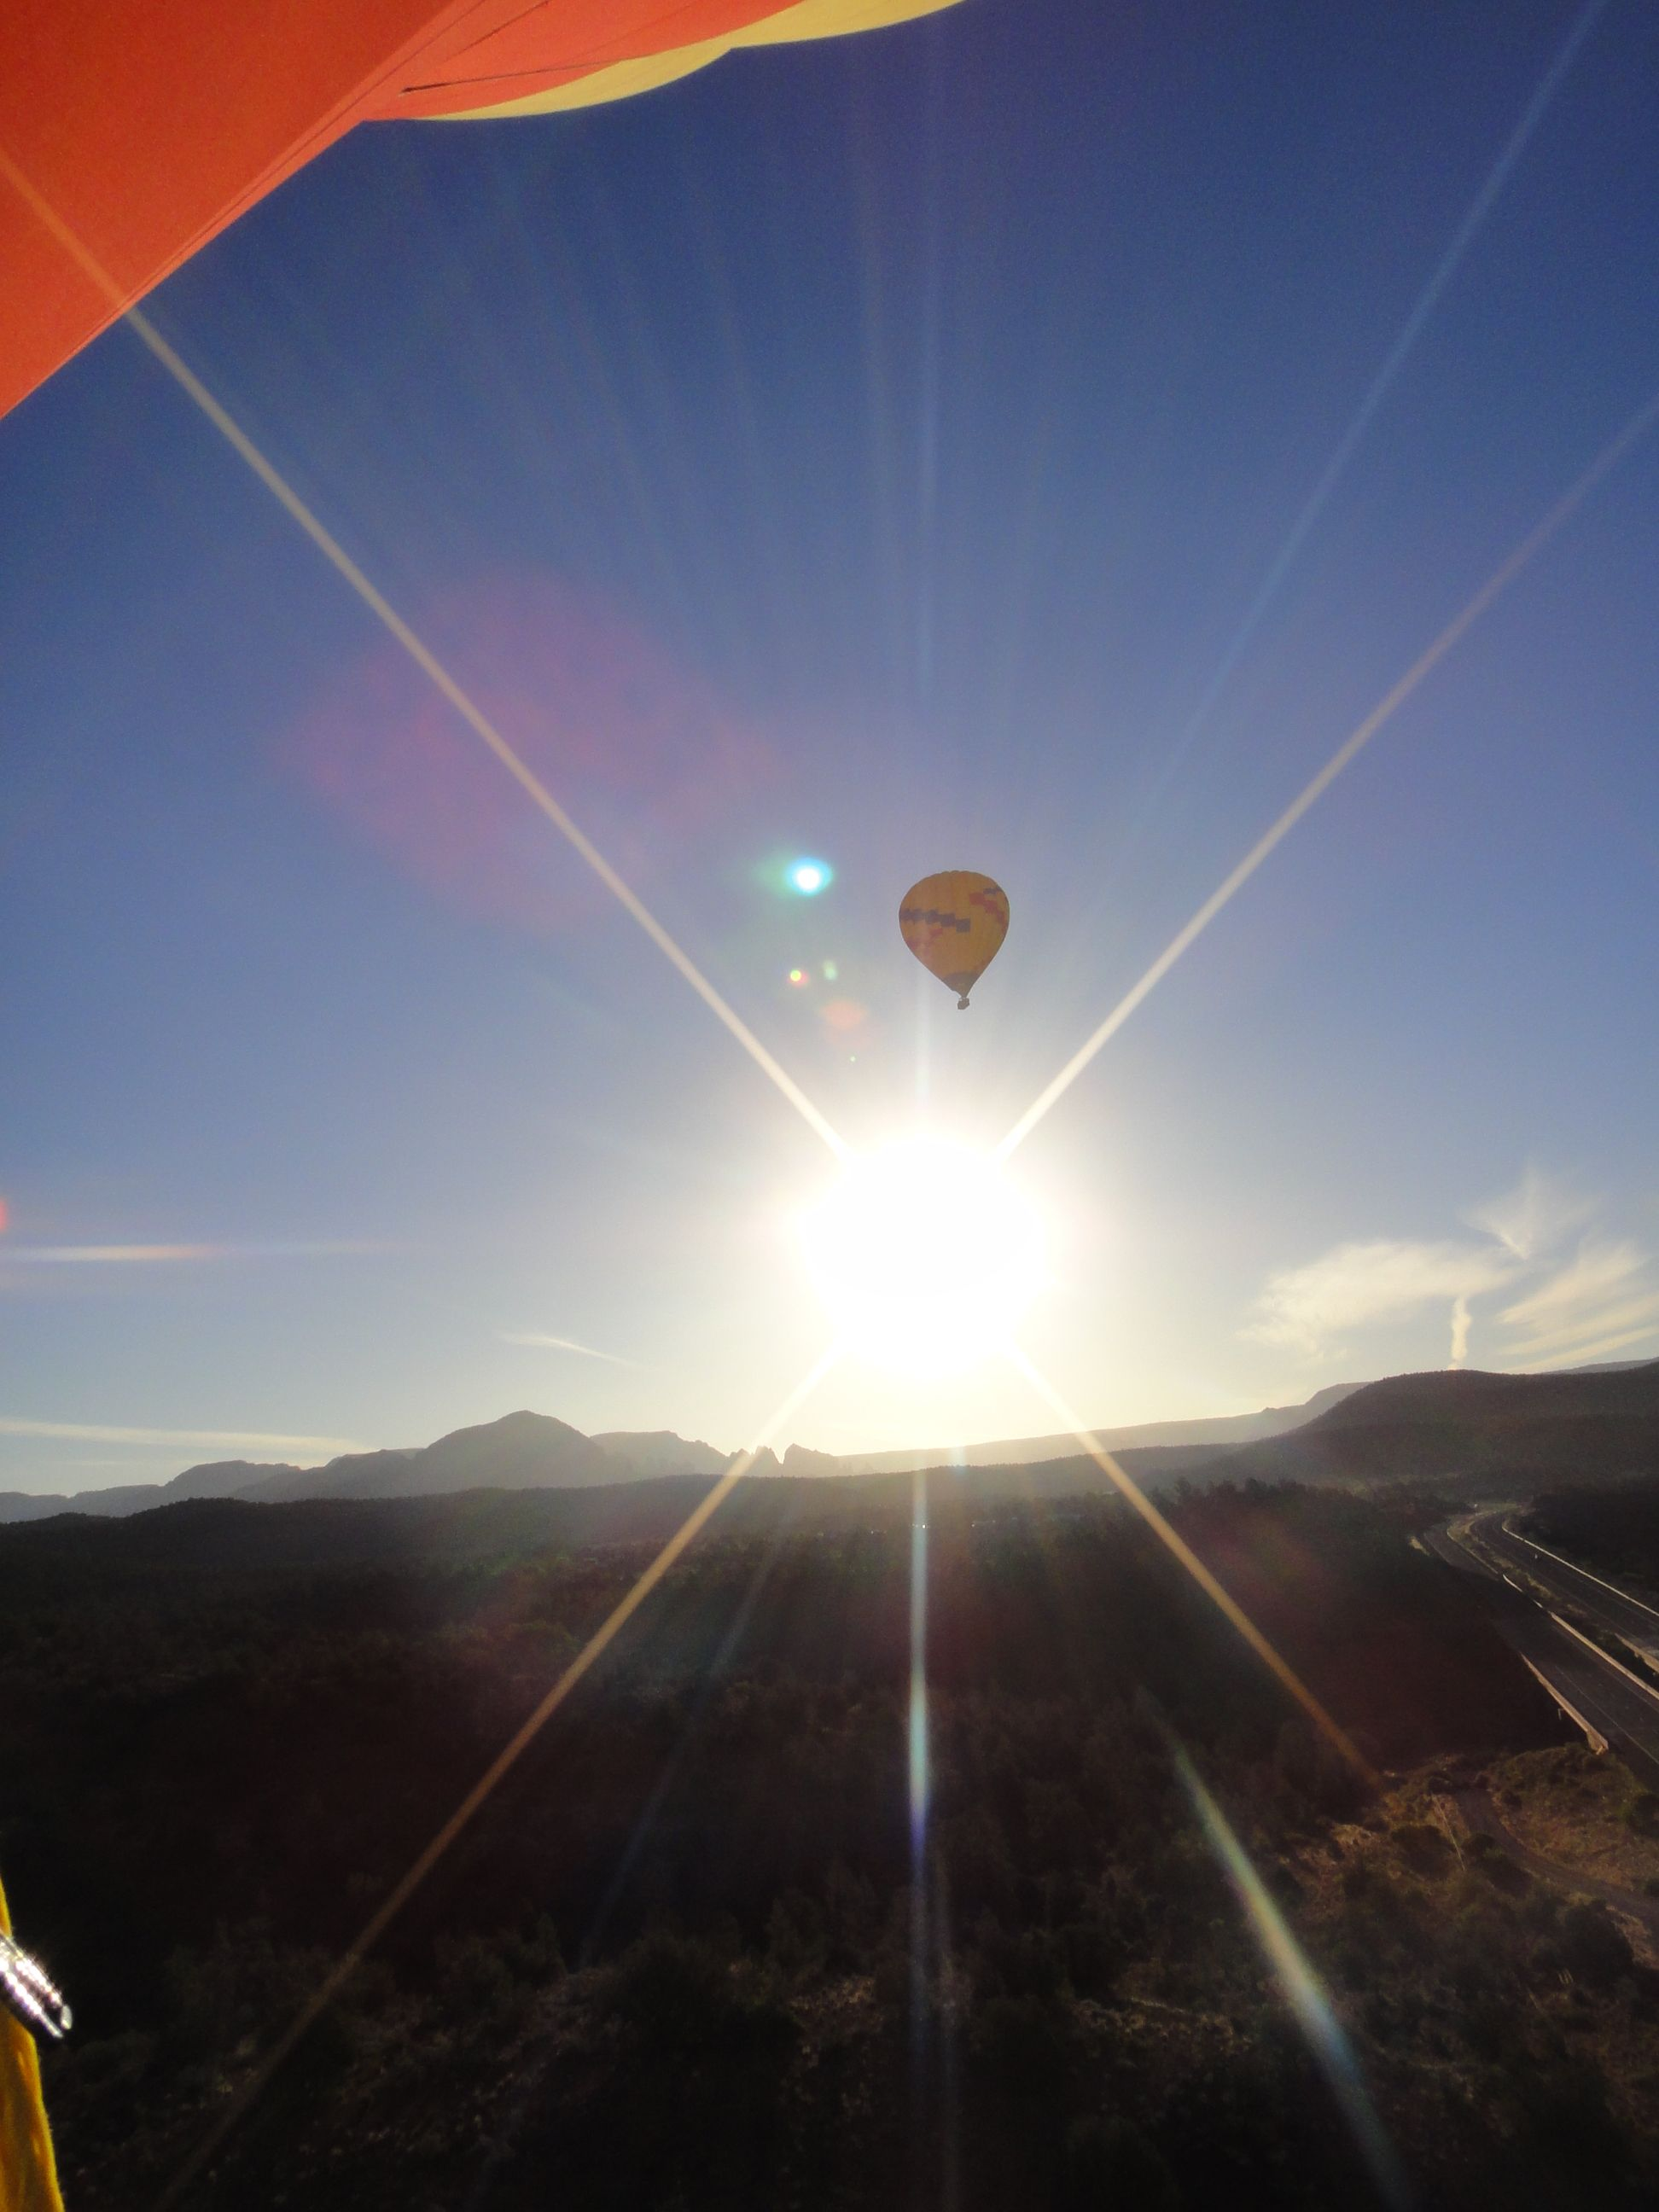 Hot air ballooning in Sedona, Arizona (With images) Air